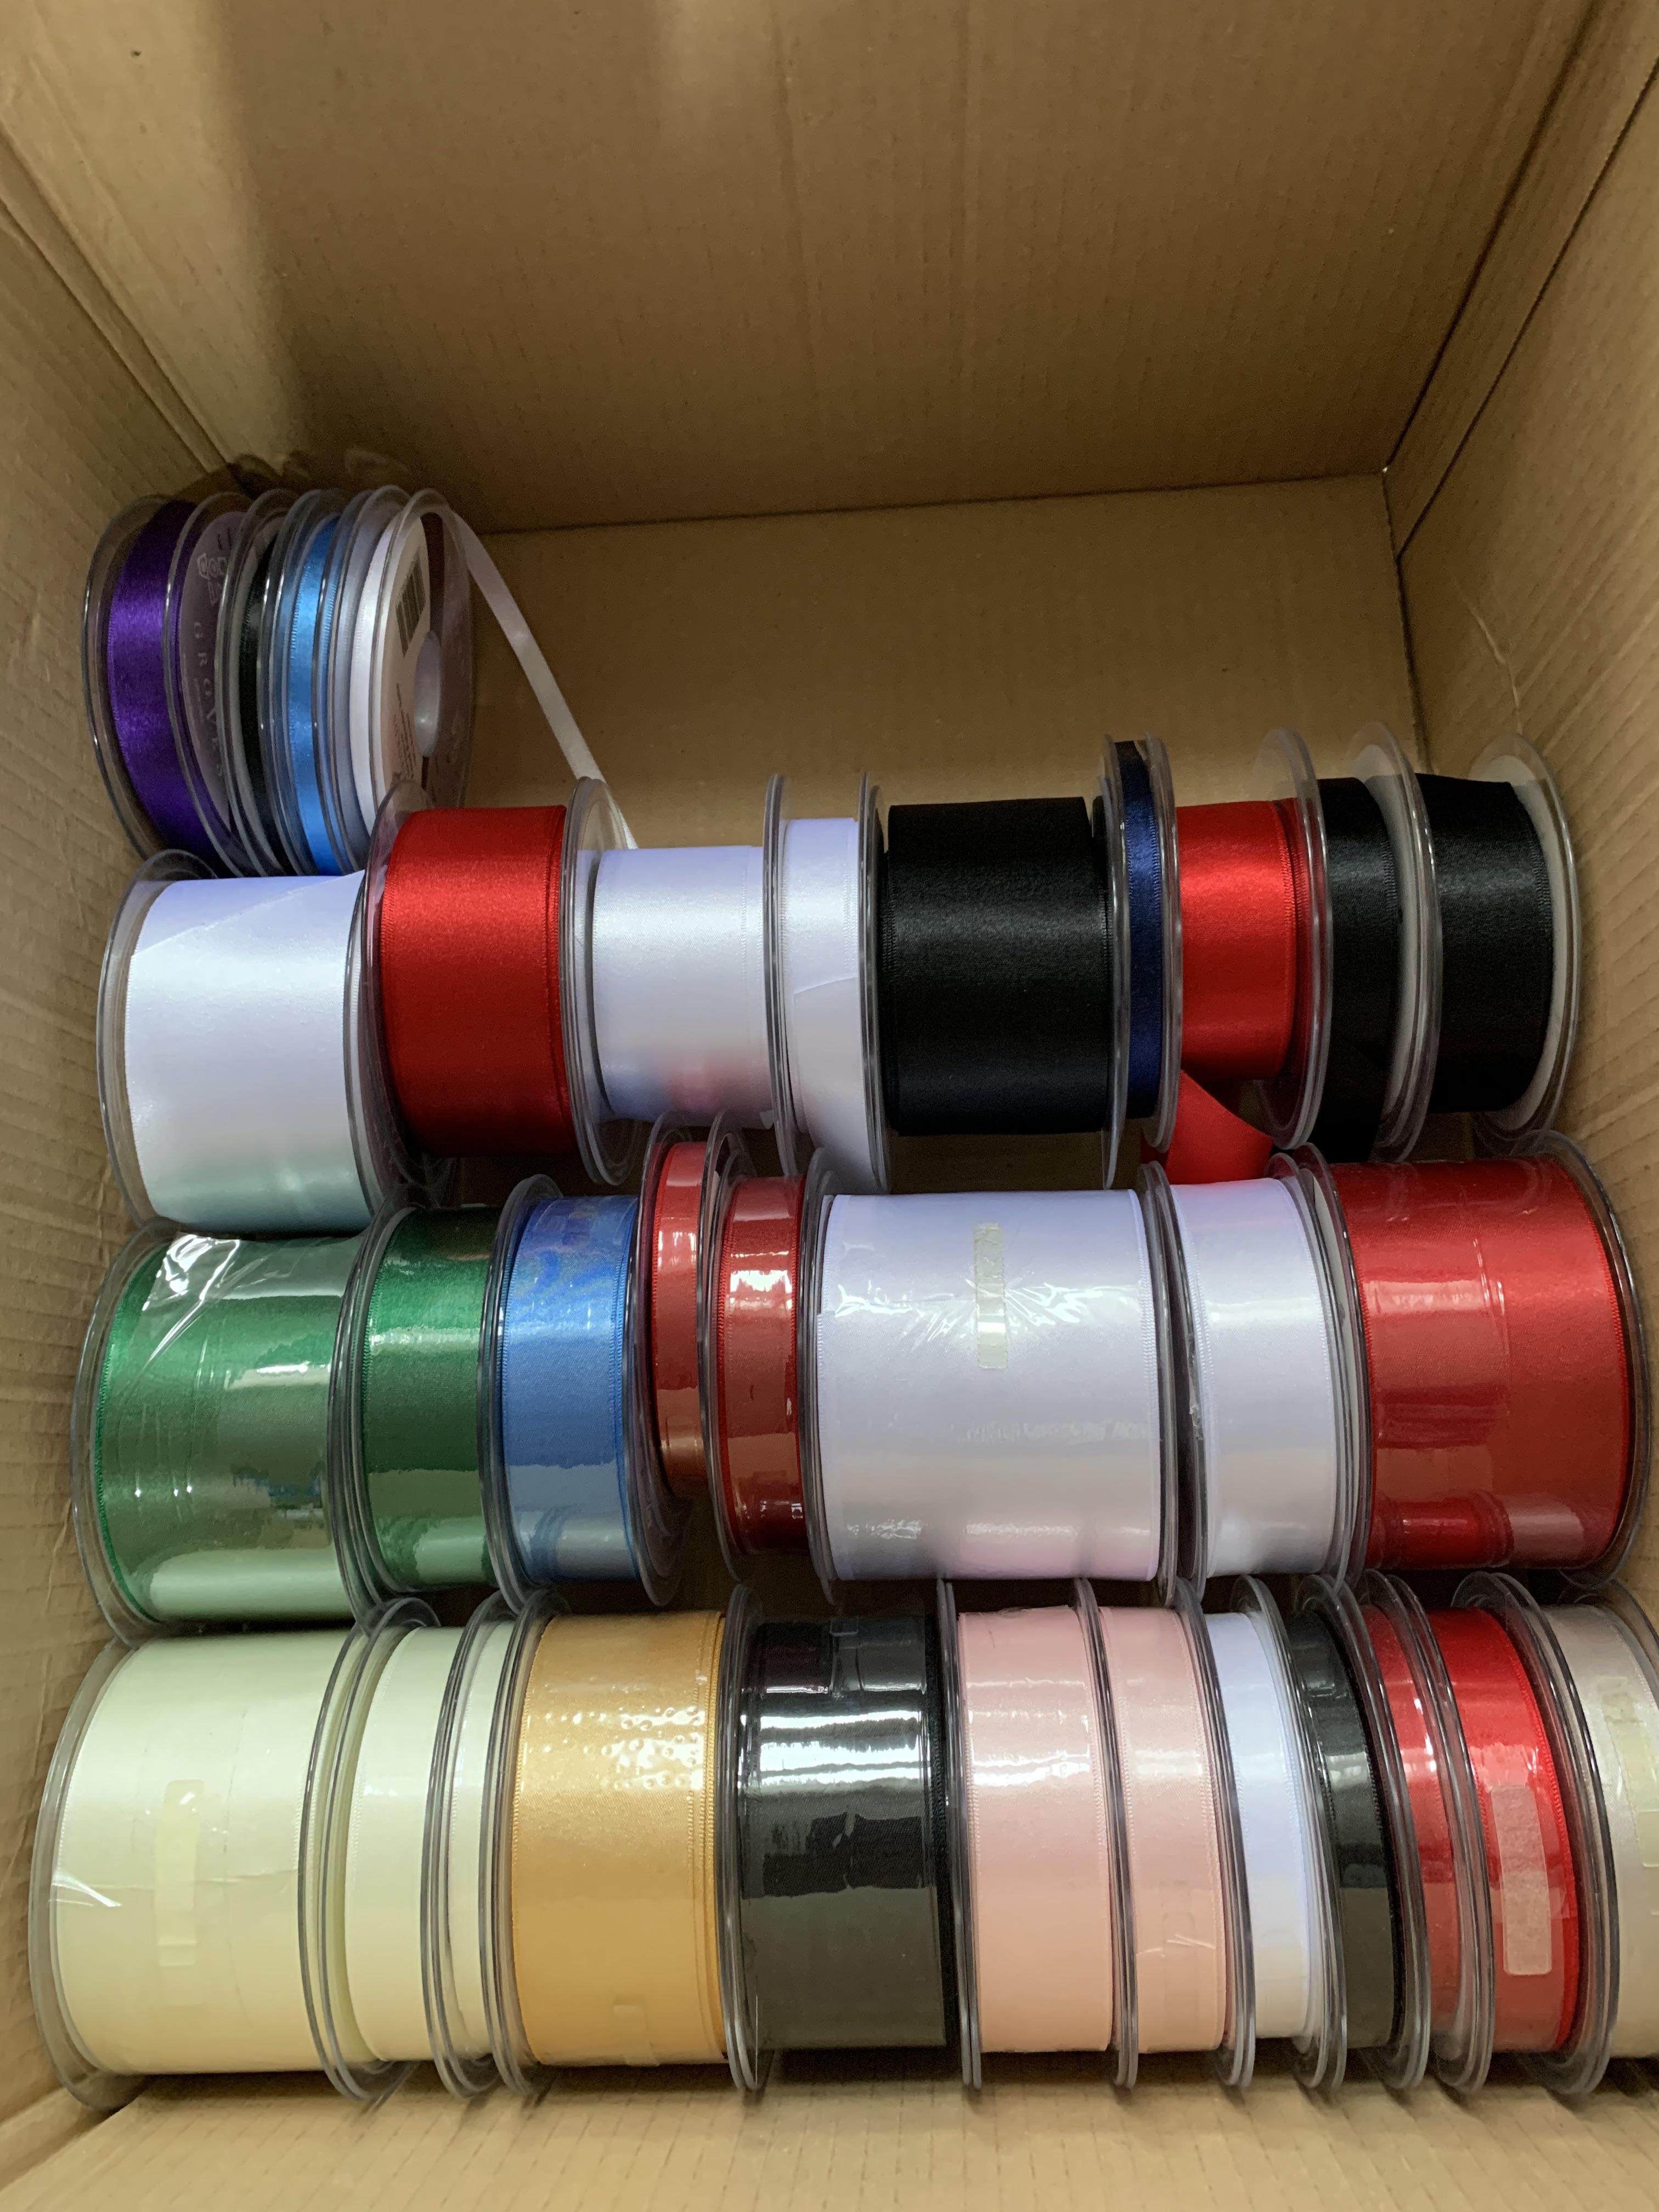 Huge Joblot of Ribbon Reels - Whole reels and part reels, ready to sell - satin, grosgrain, lame, velvet & more